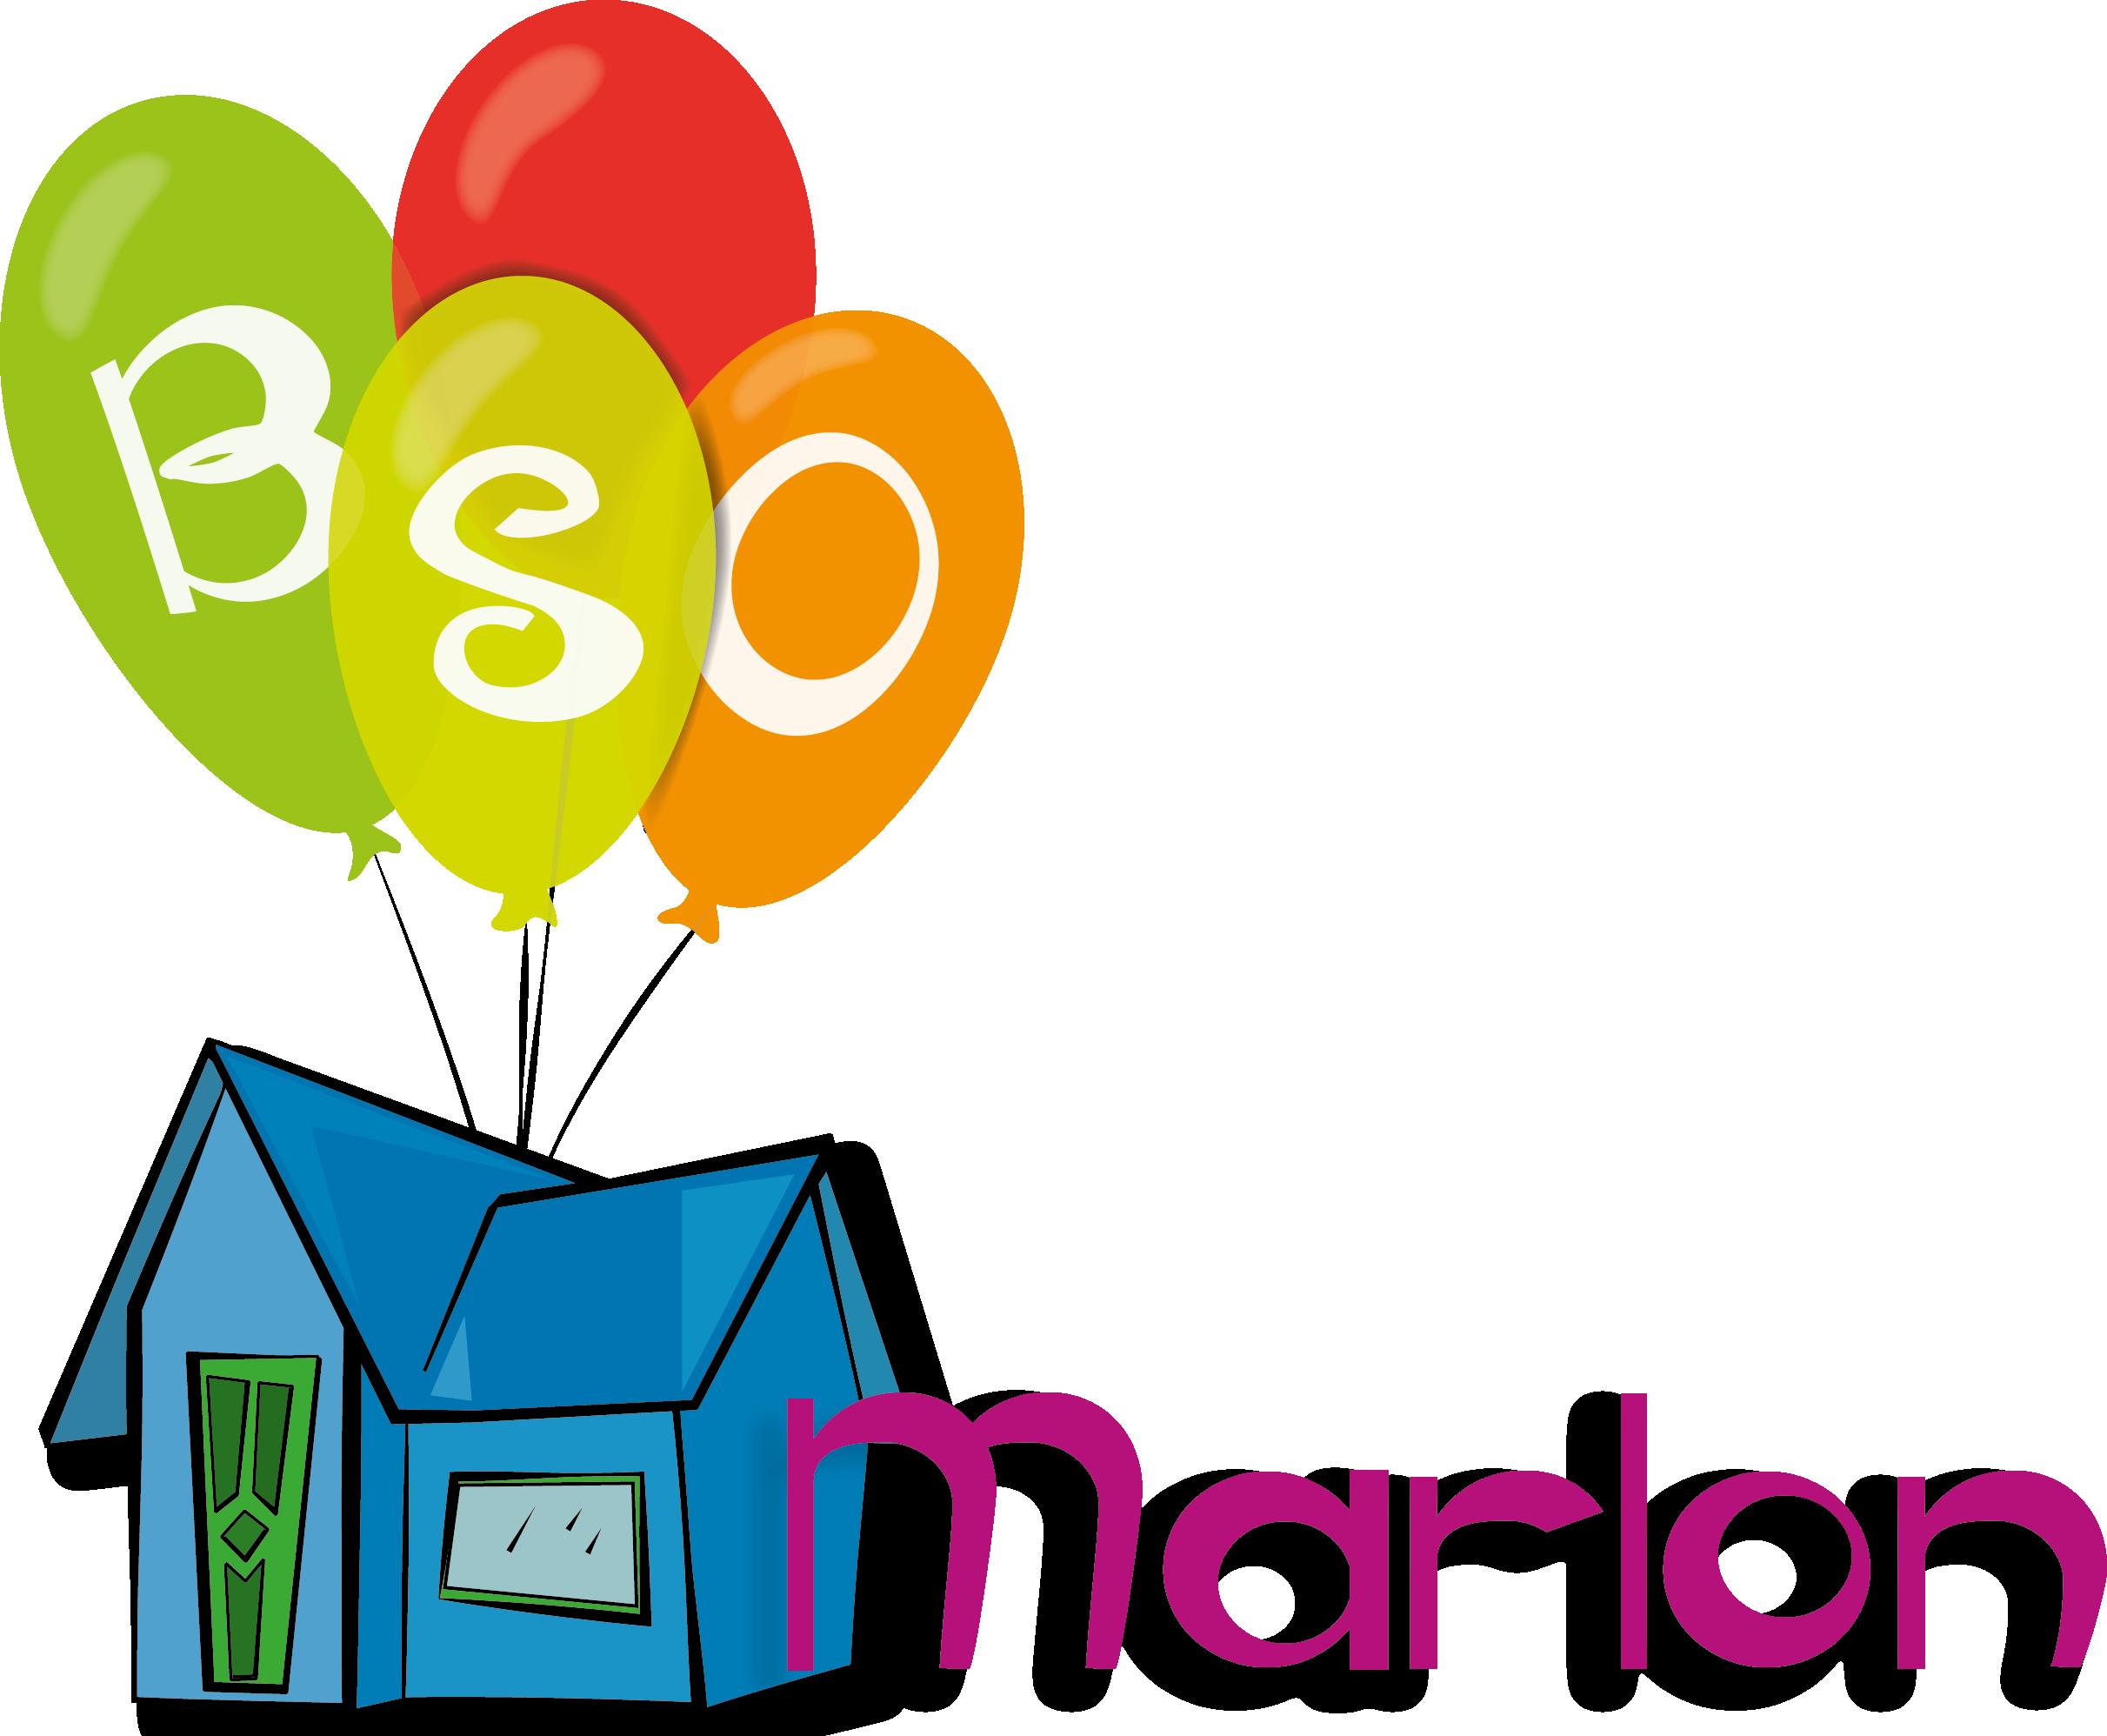 BSO Marlon